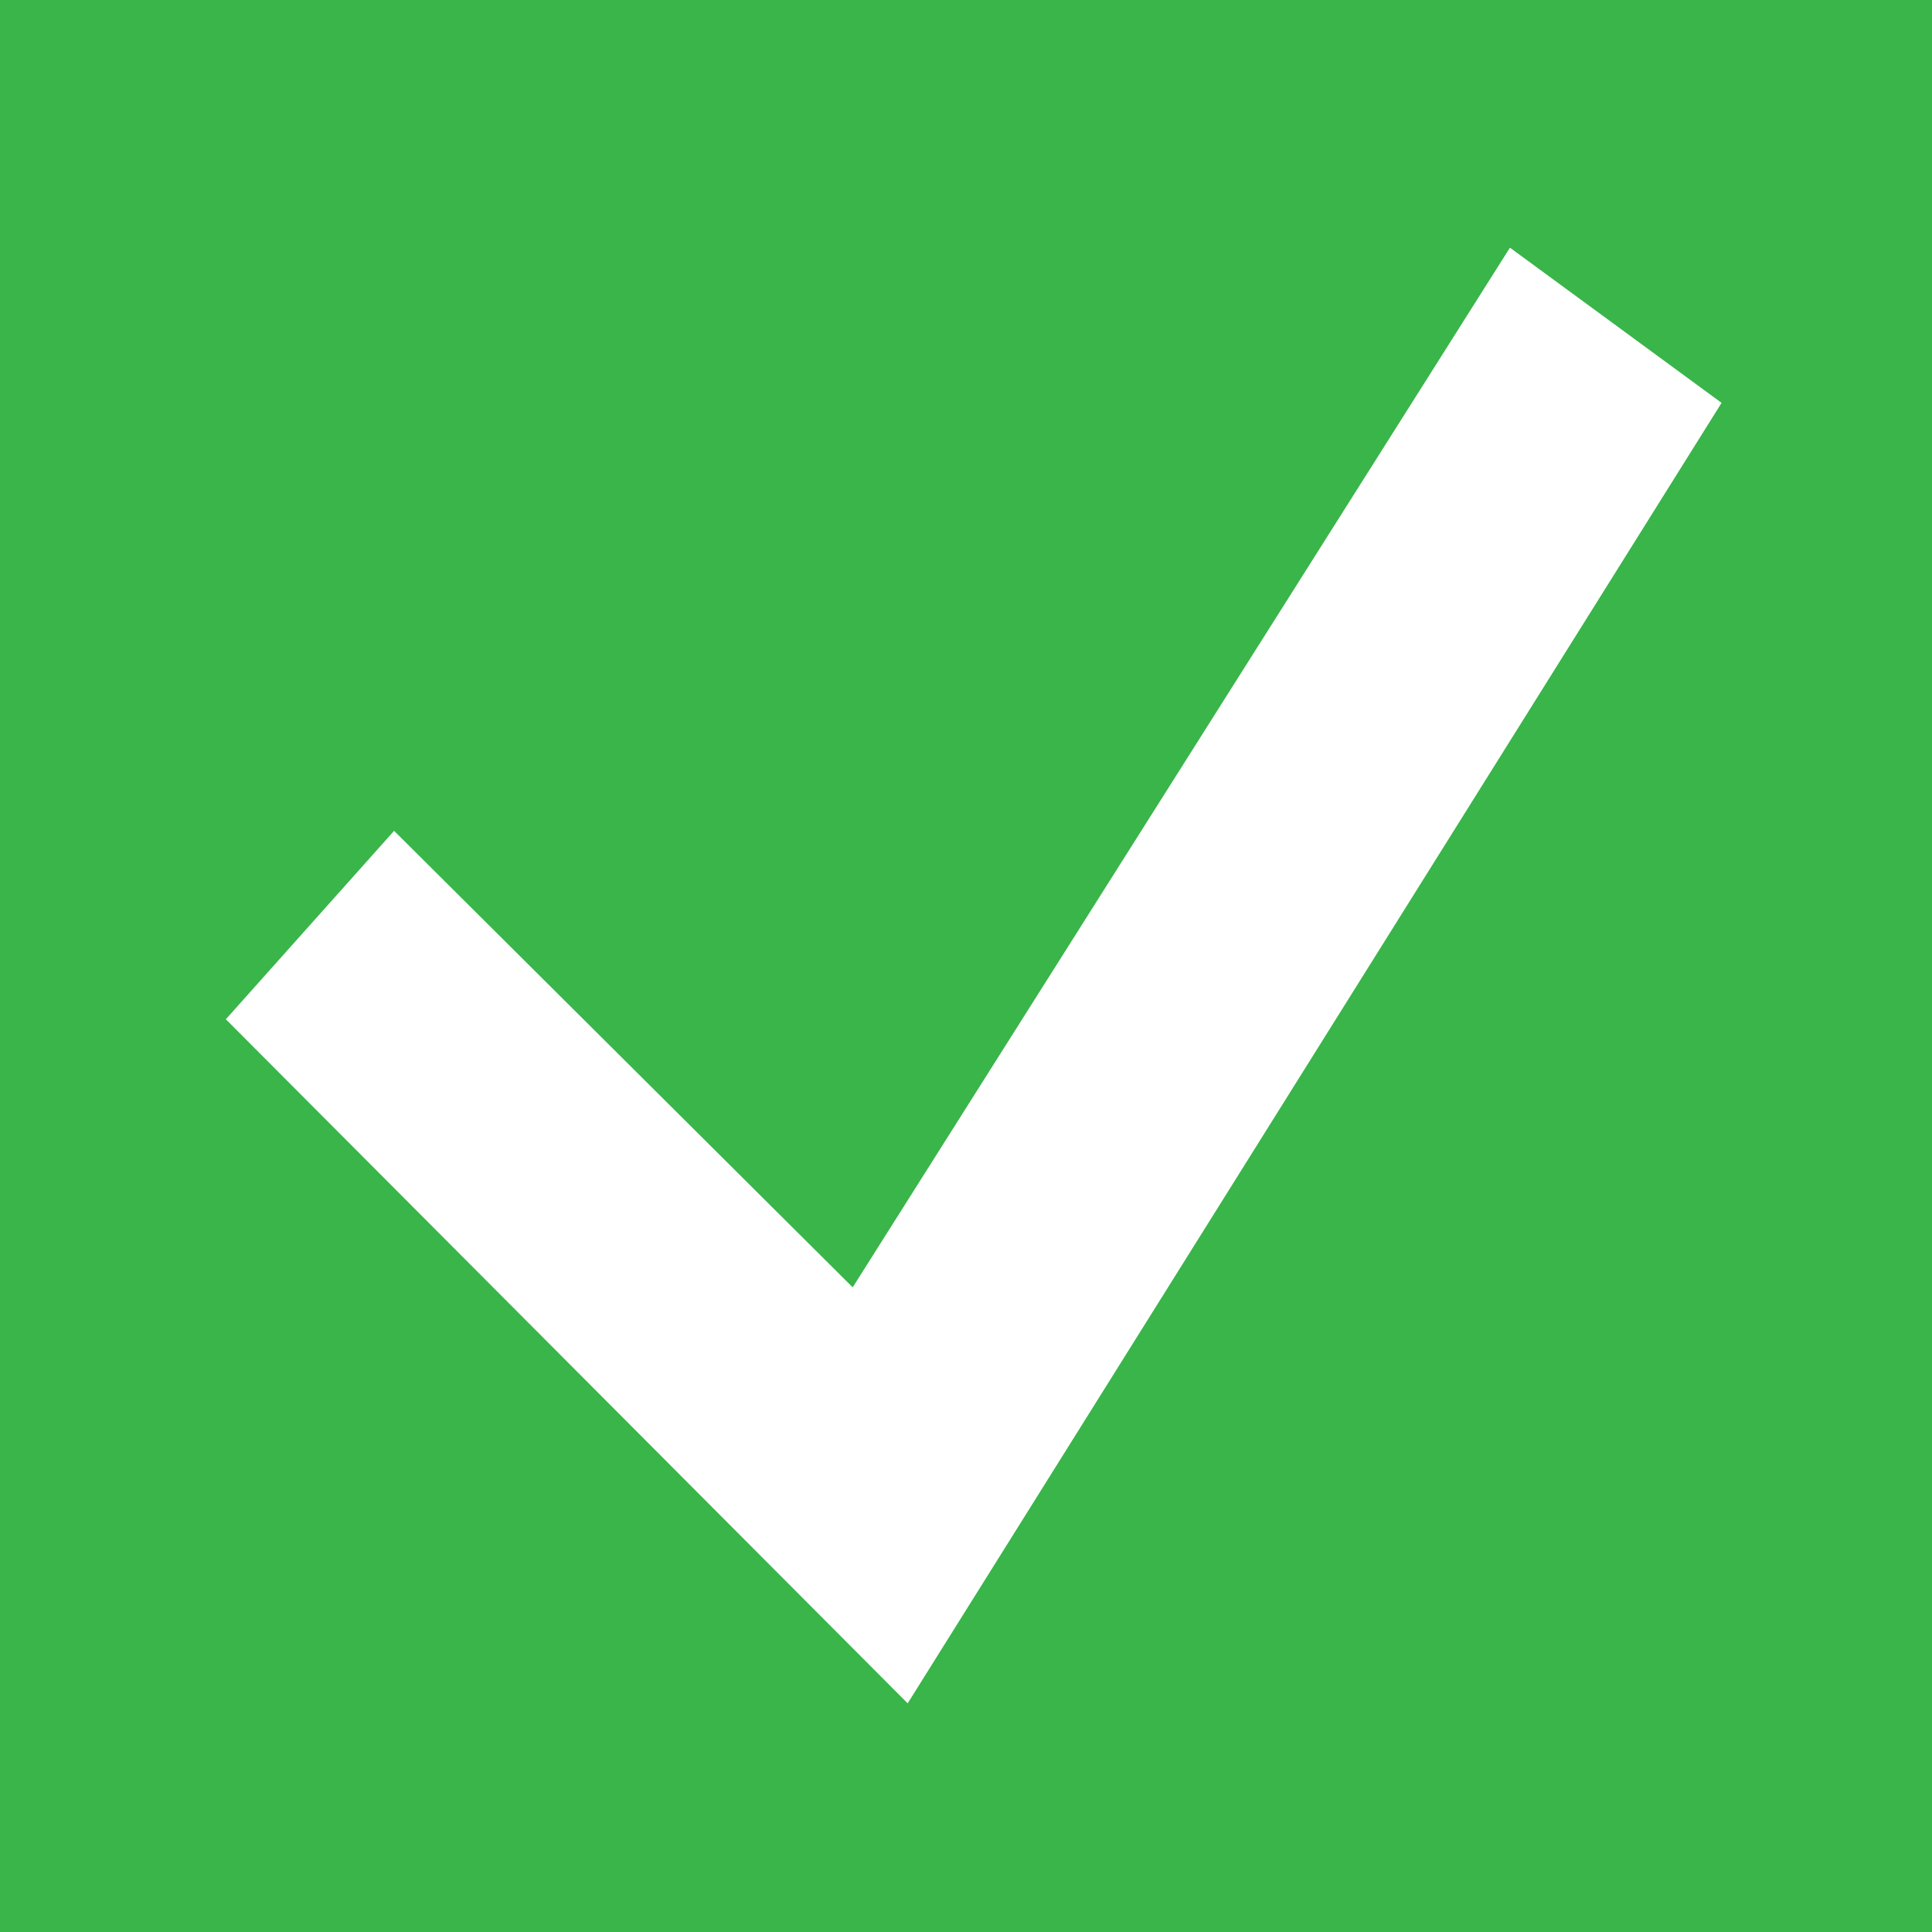 vector free download Mark. Check clipart checkmart.